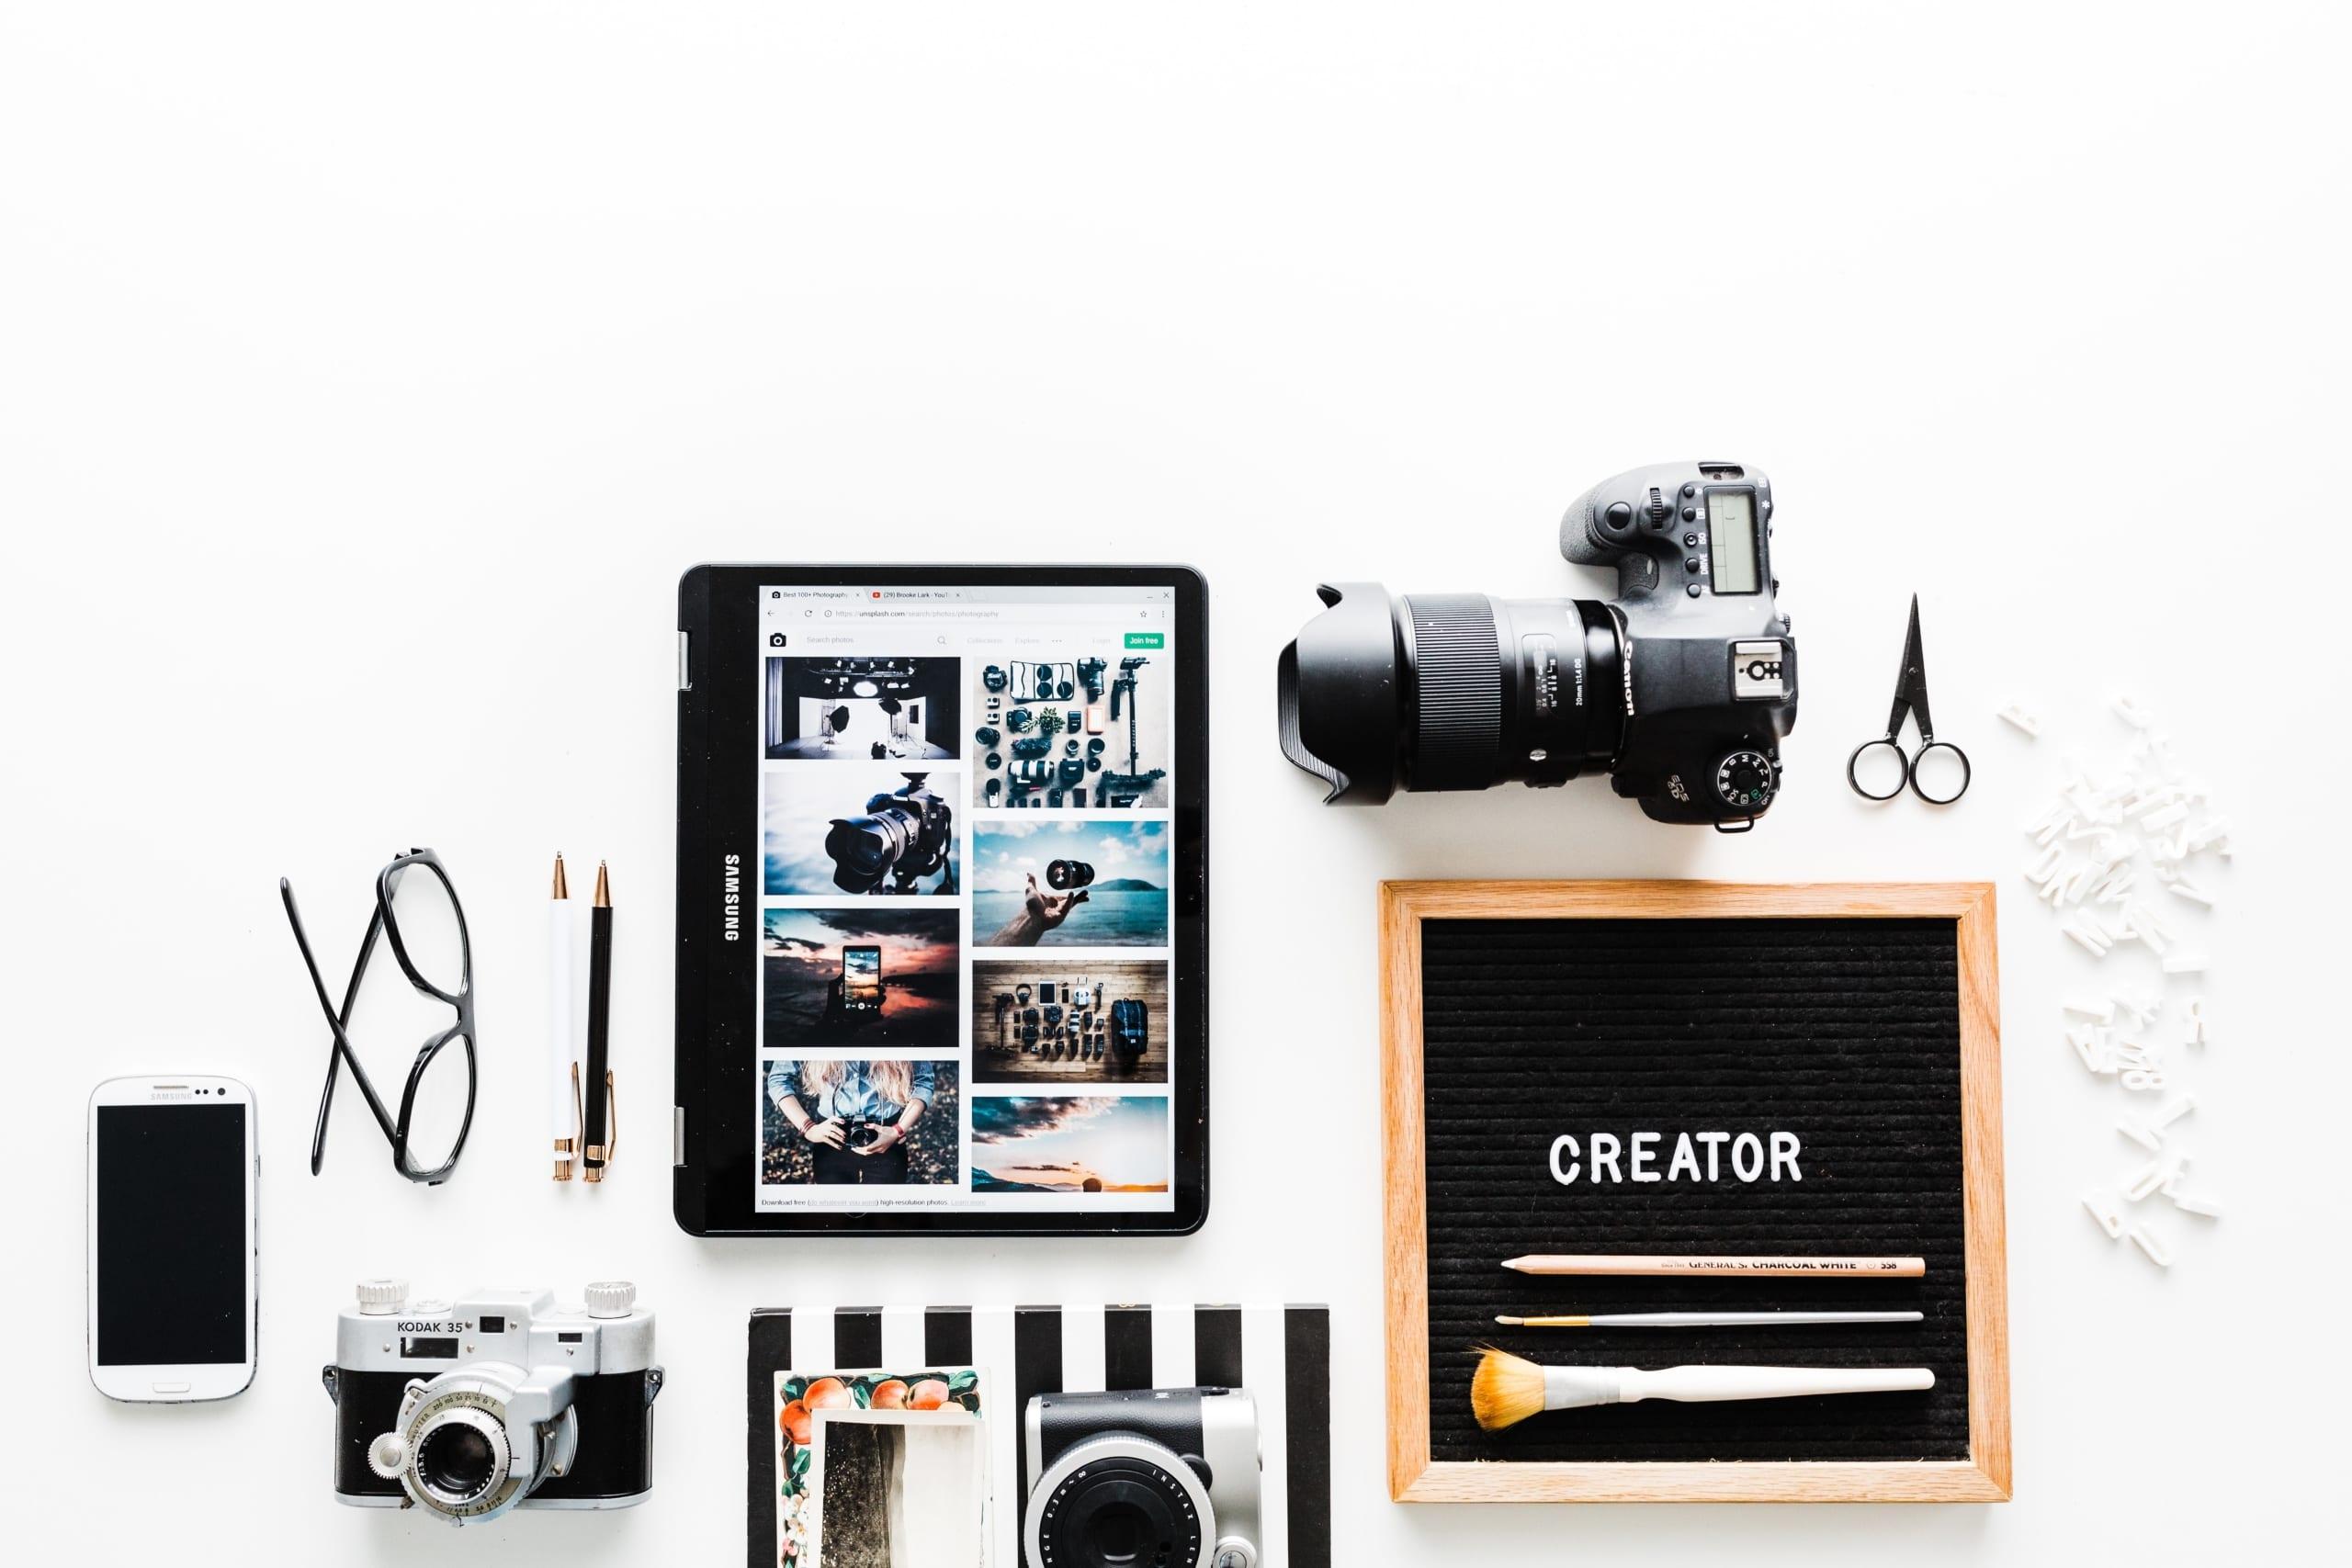 Creating digital content fast